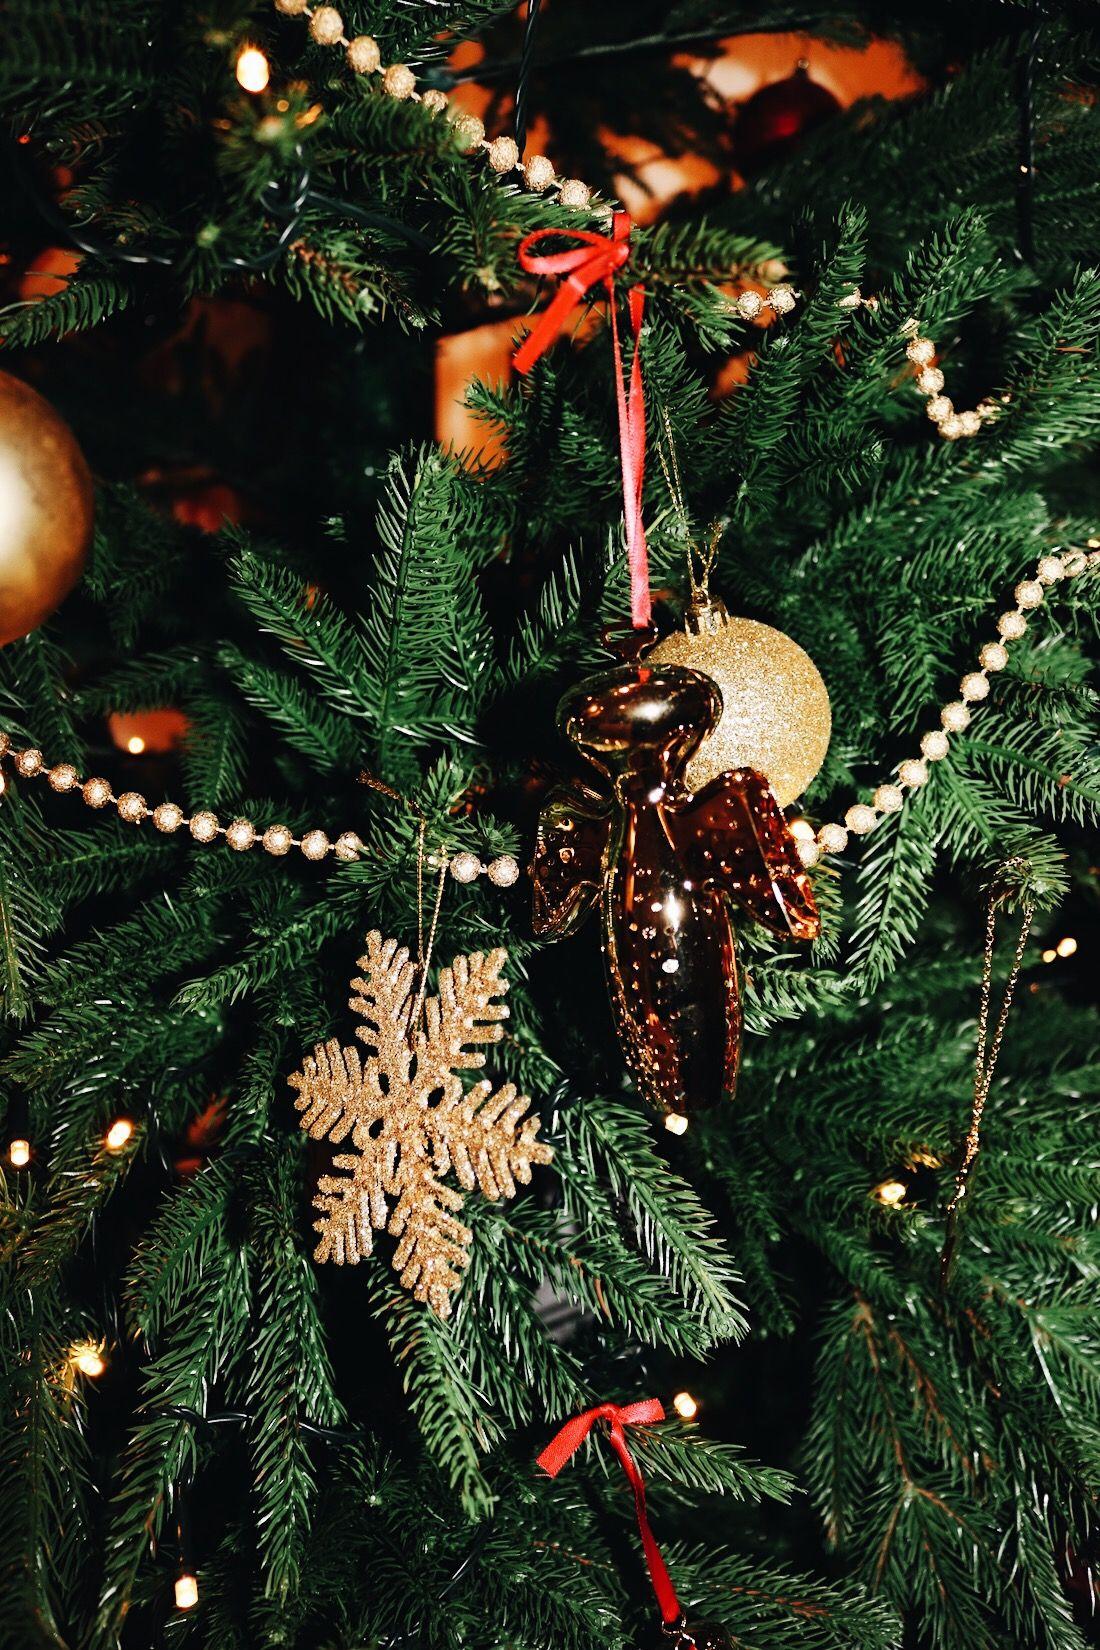 Gizem Arabaci Adli Kullanicinin Christmas Panosundaki Pin